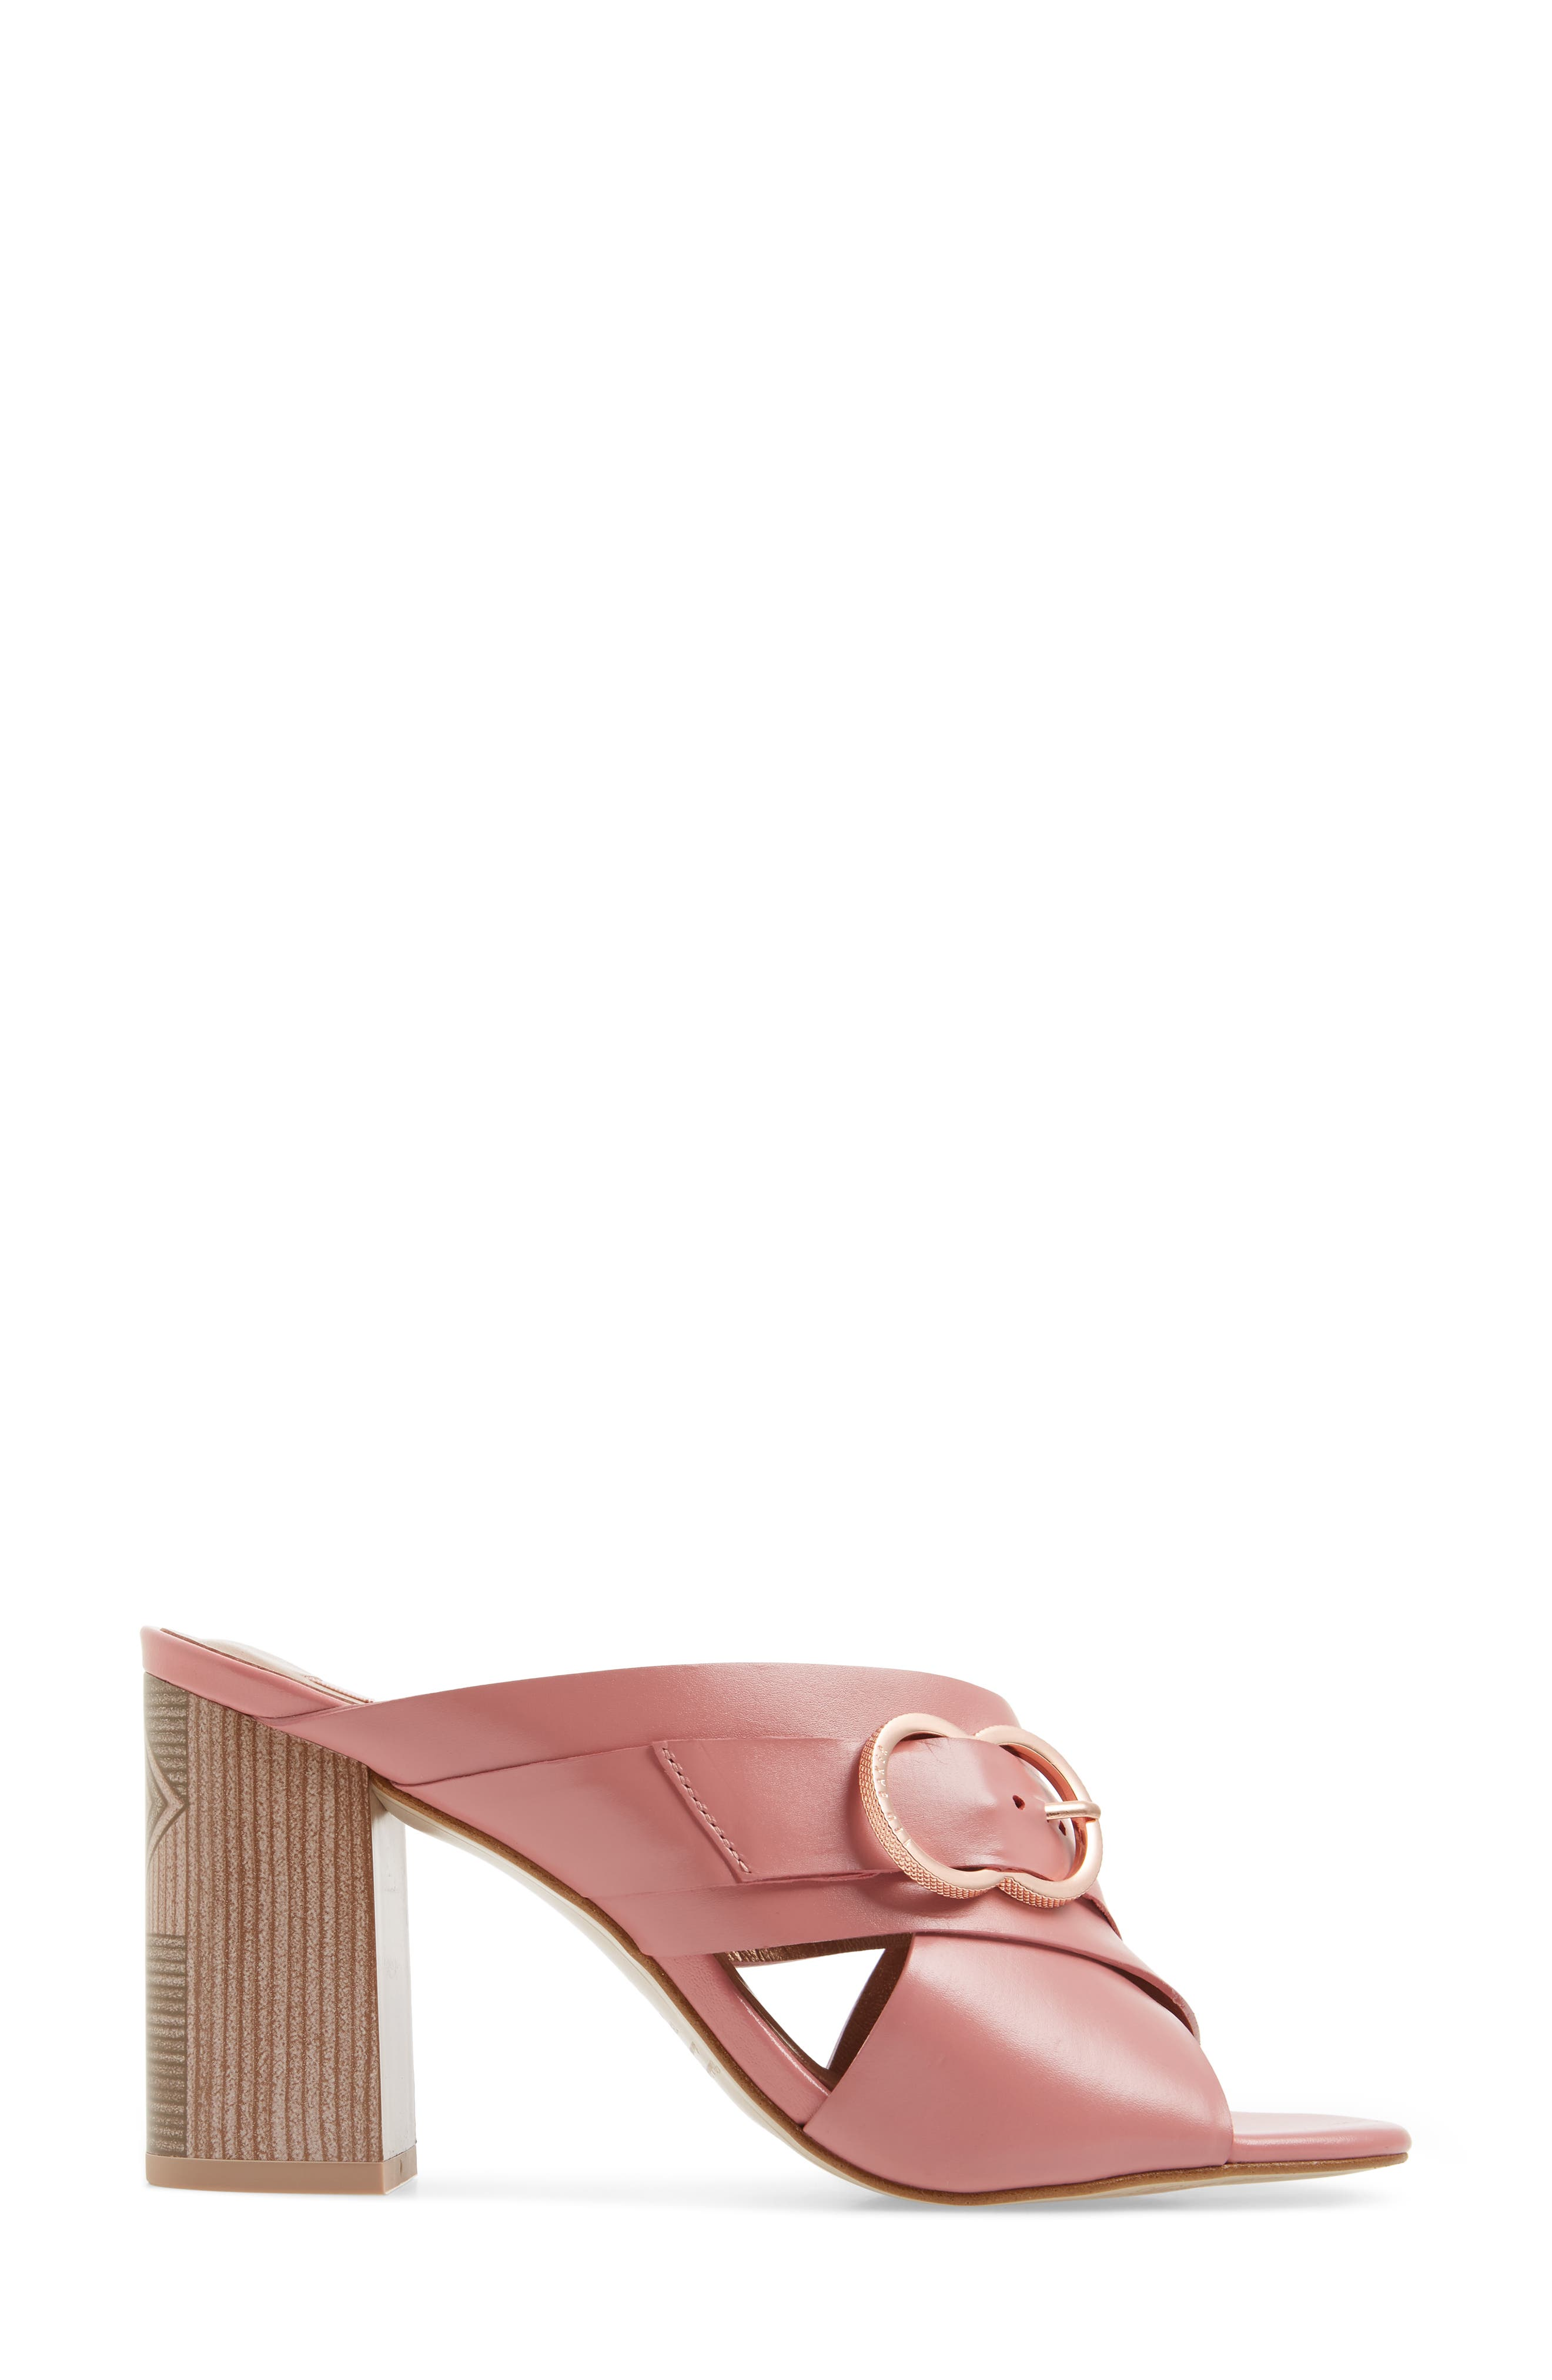 Malada Slide Sandal,                             Alternate thumbnail 3, color,                             Pink Leather